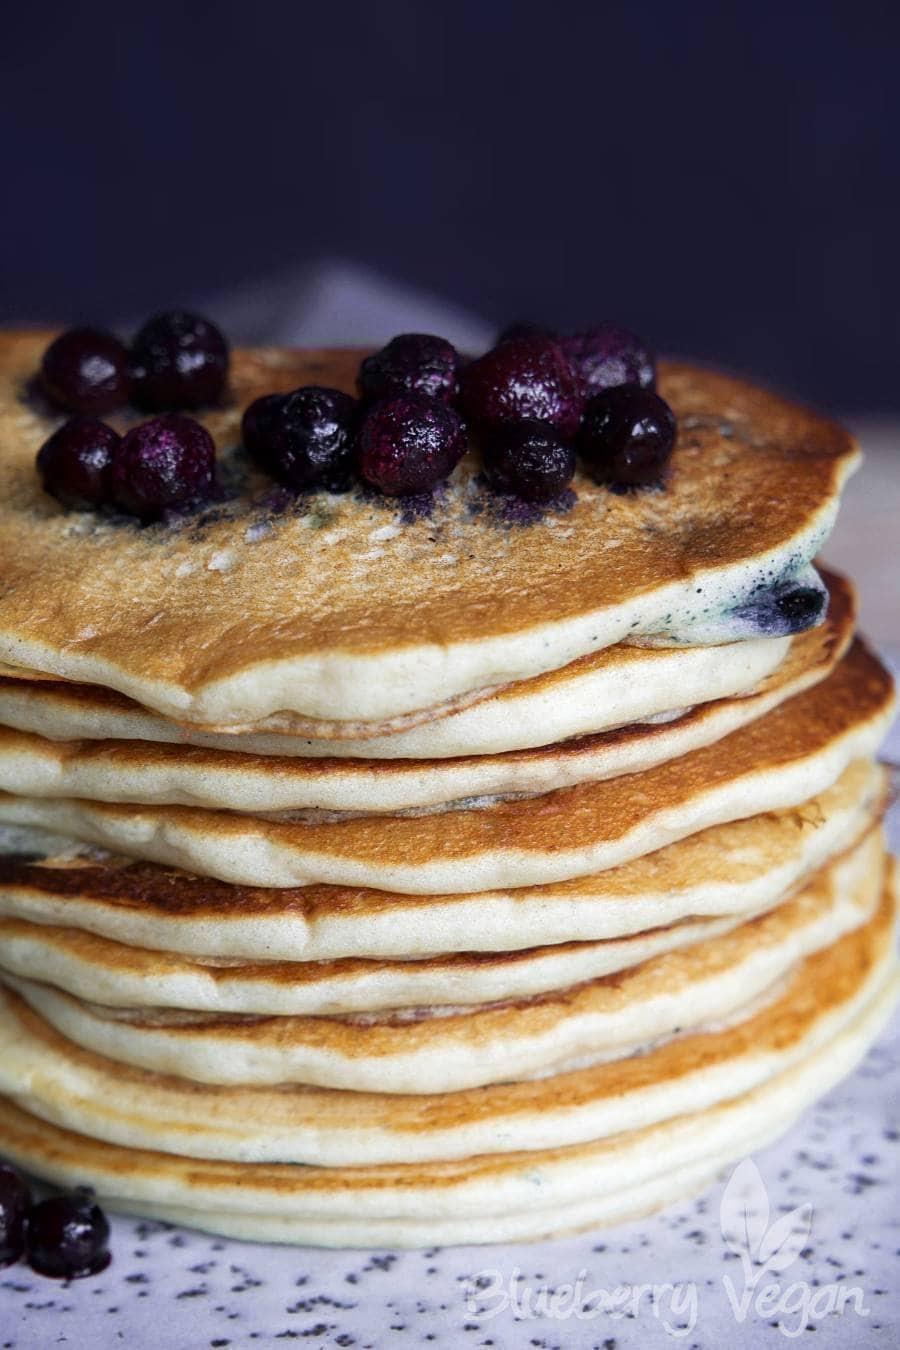 Leckere Blaubeer-Buttermilch-Pancakes